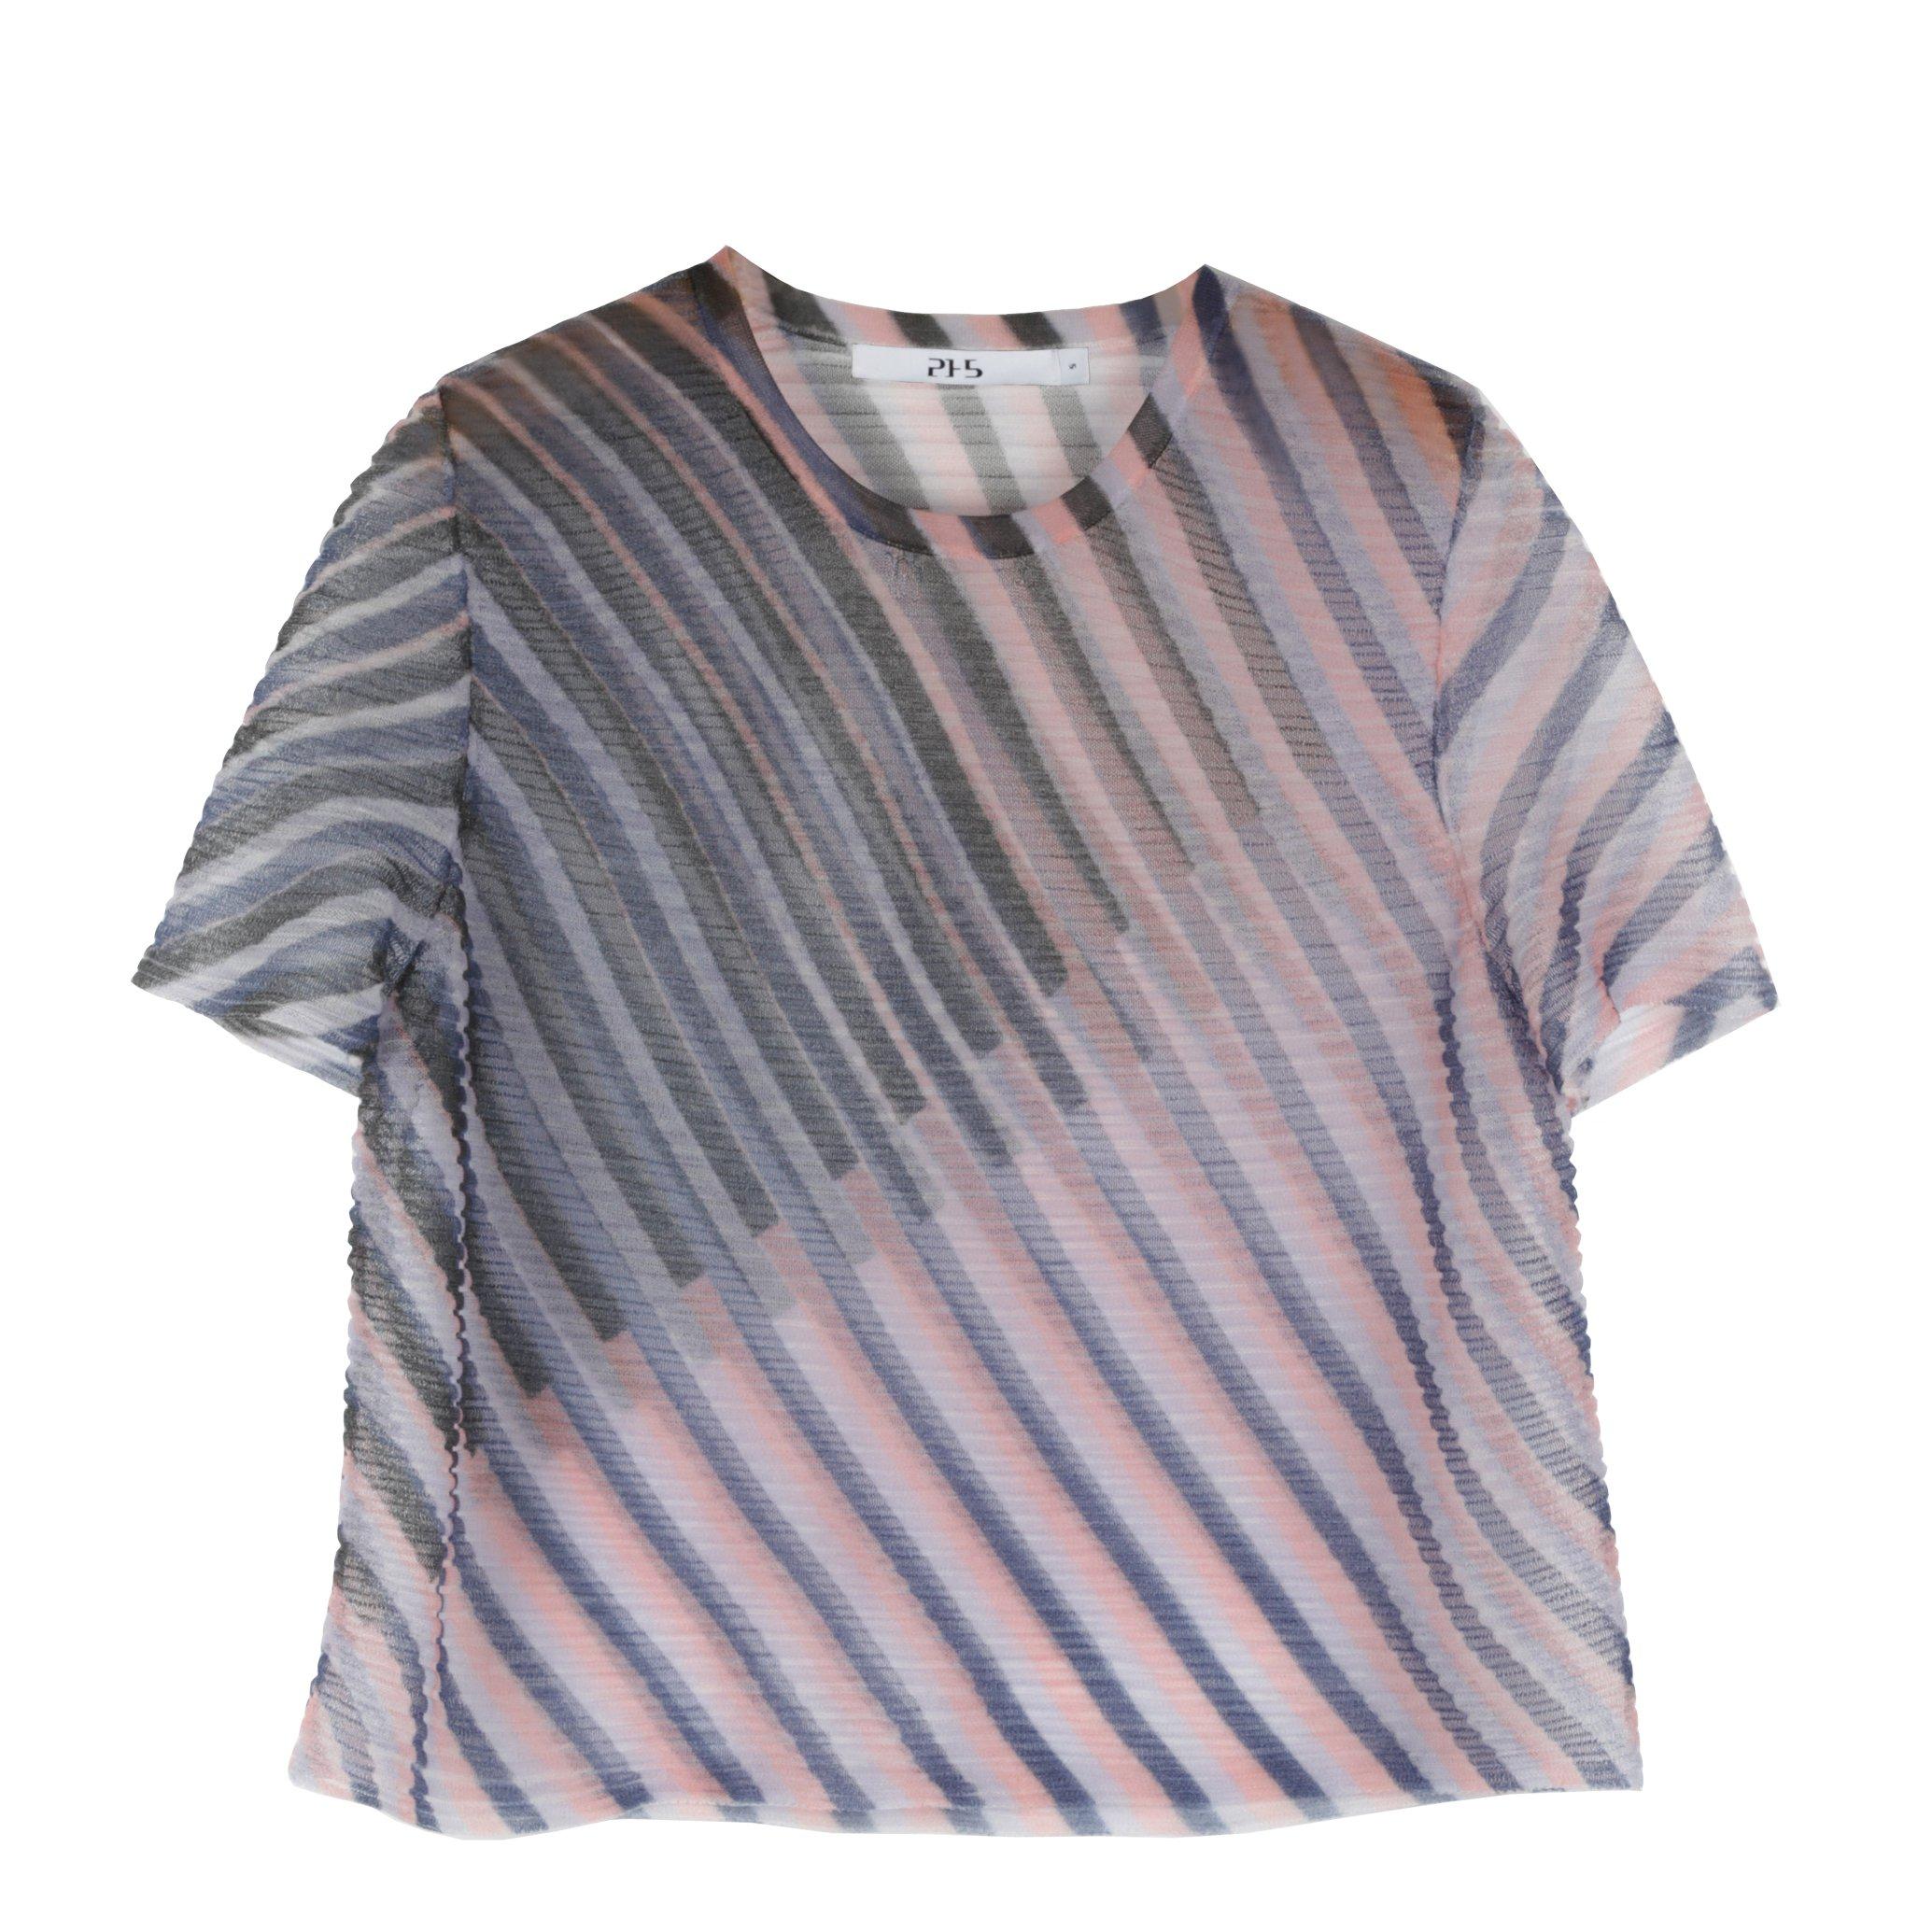 25e94d83 Rhapsody Digital Printed T-shirt